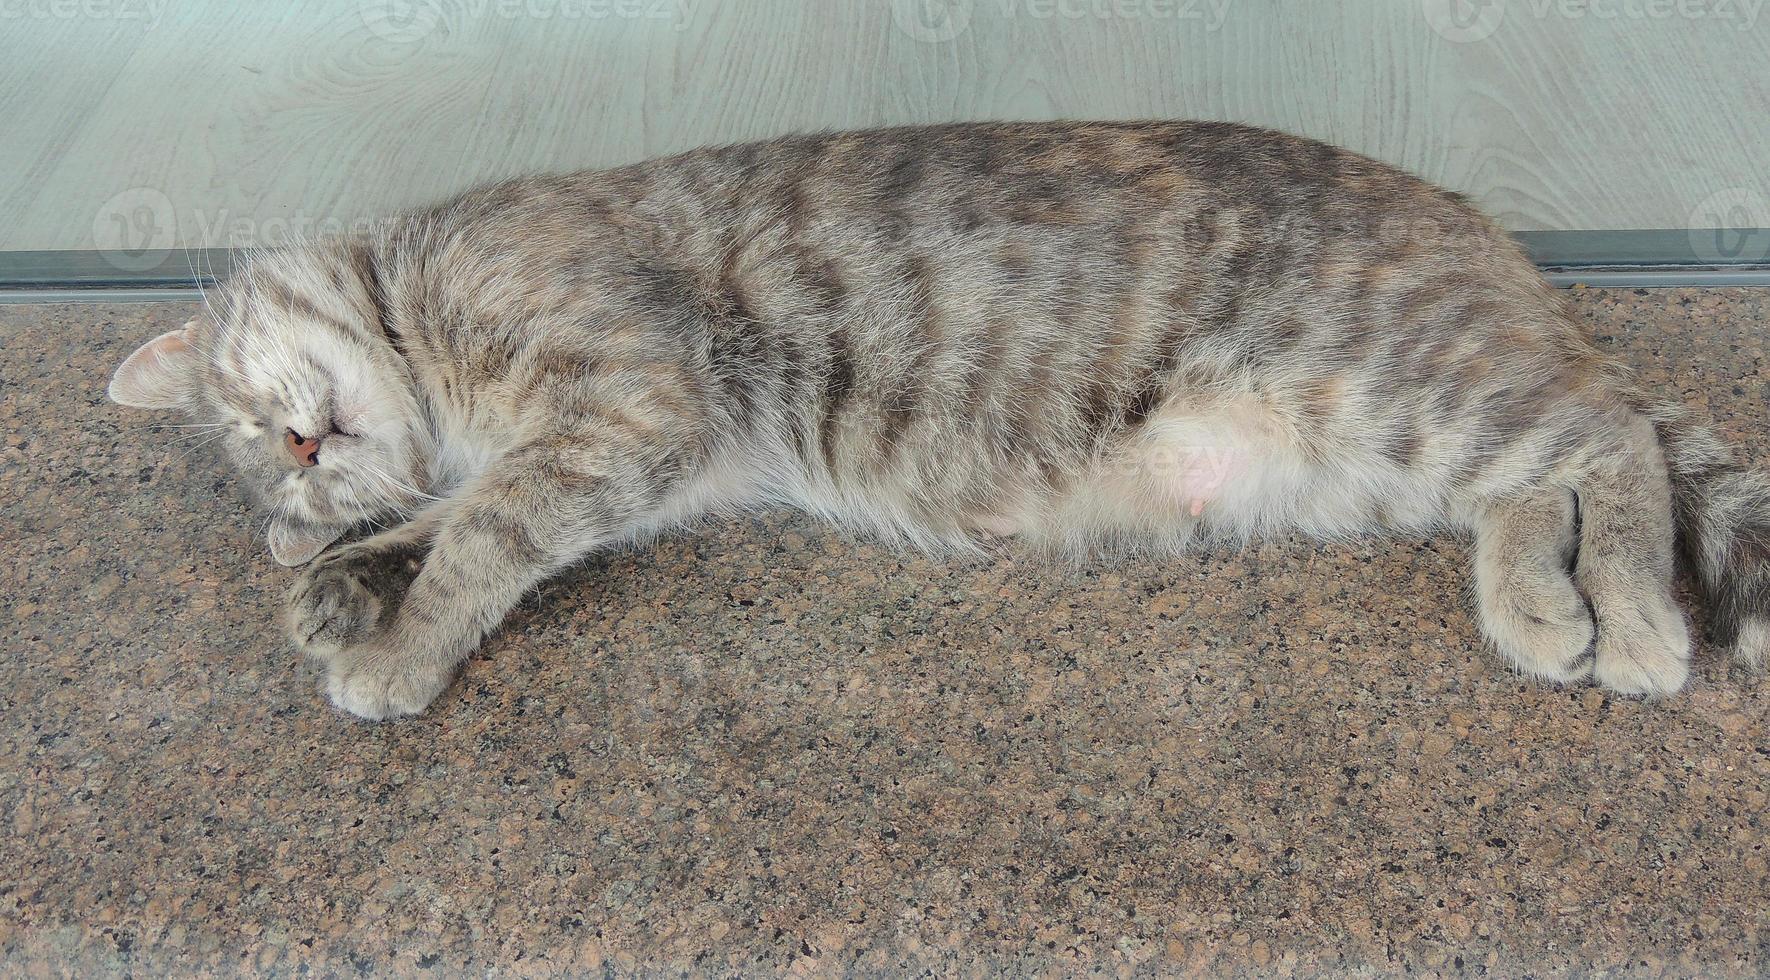 chat endormi. photo